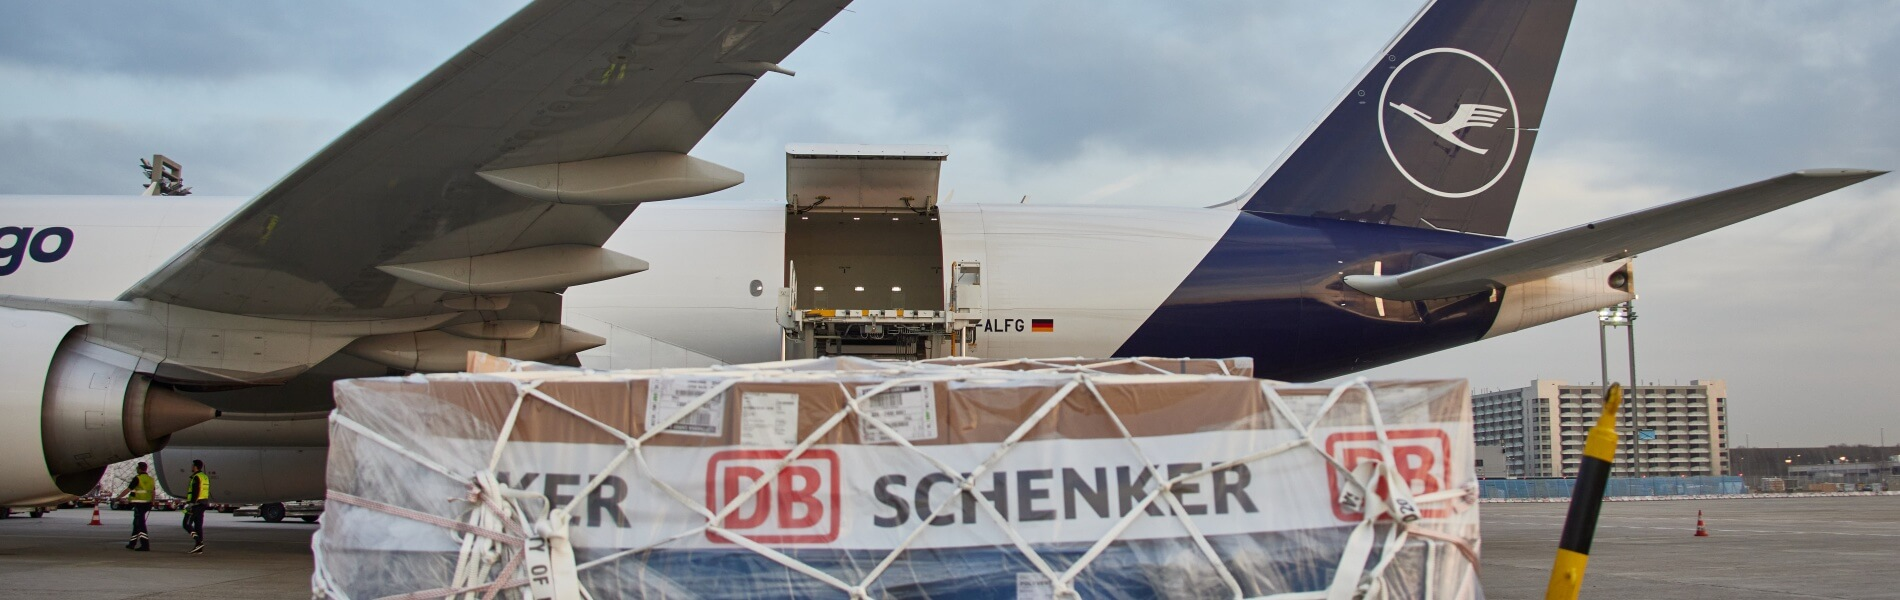 Frankfurt-Shanghai: DB Schenker fliegt regelmäßig CO2-neutral